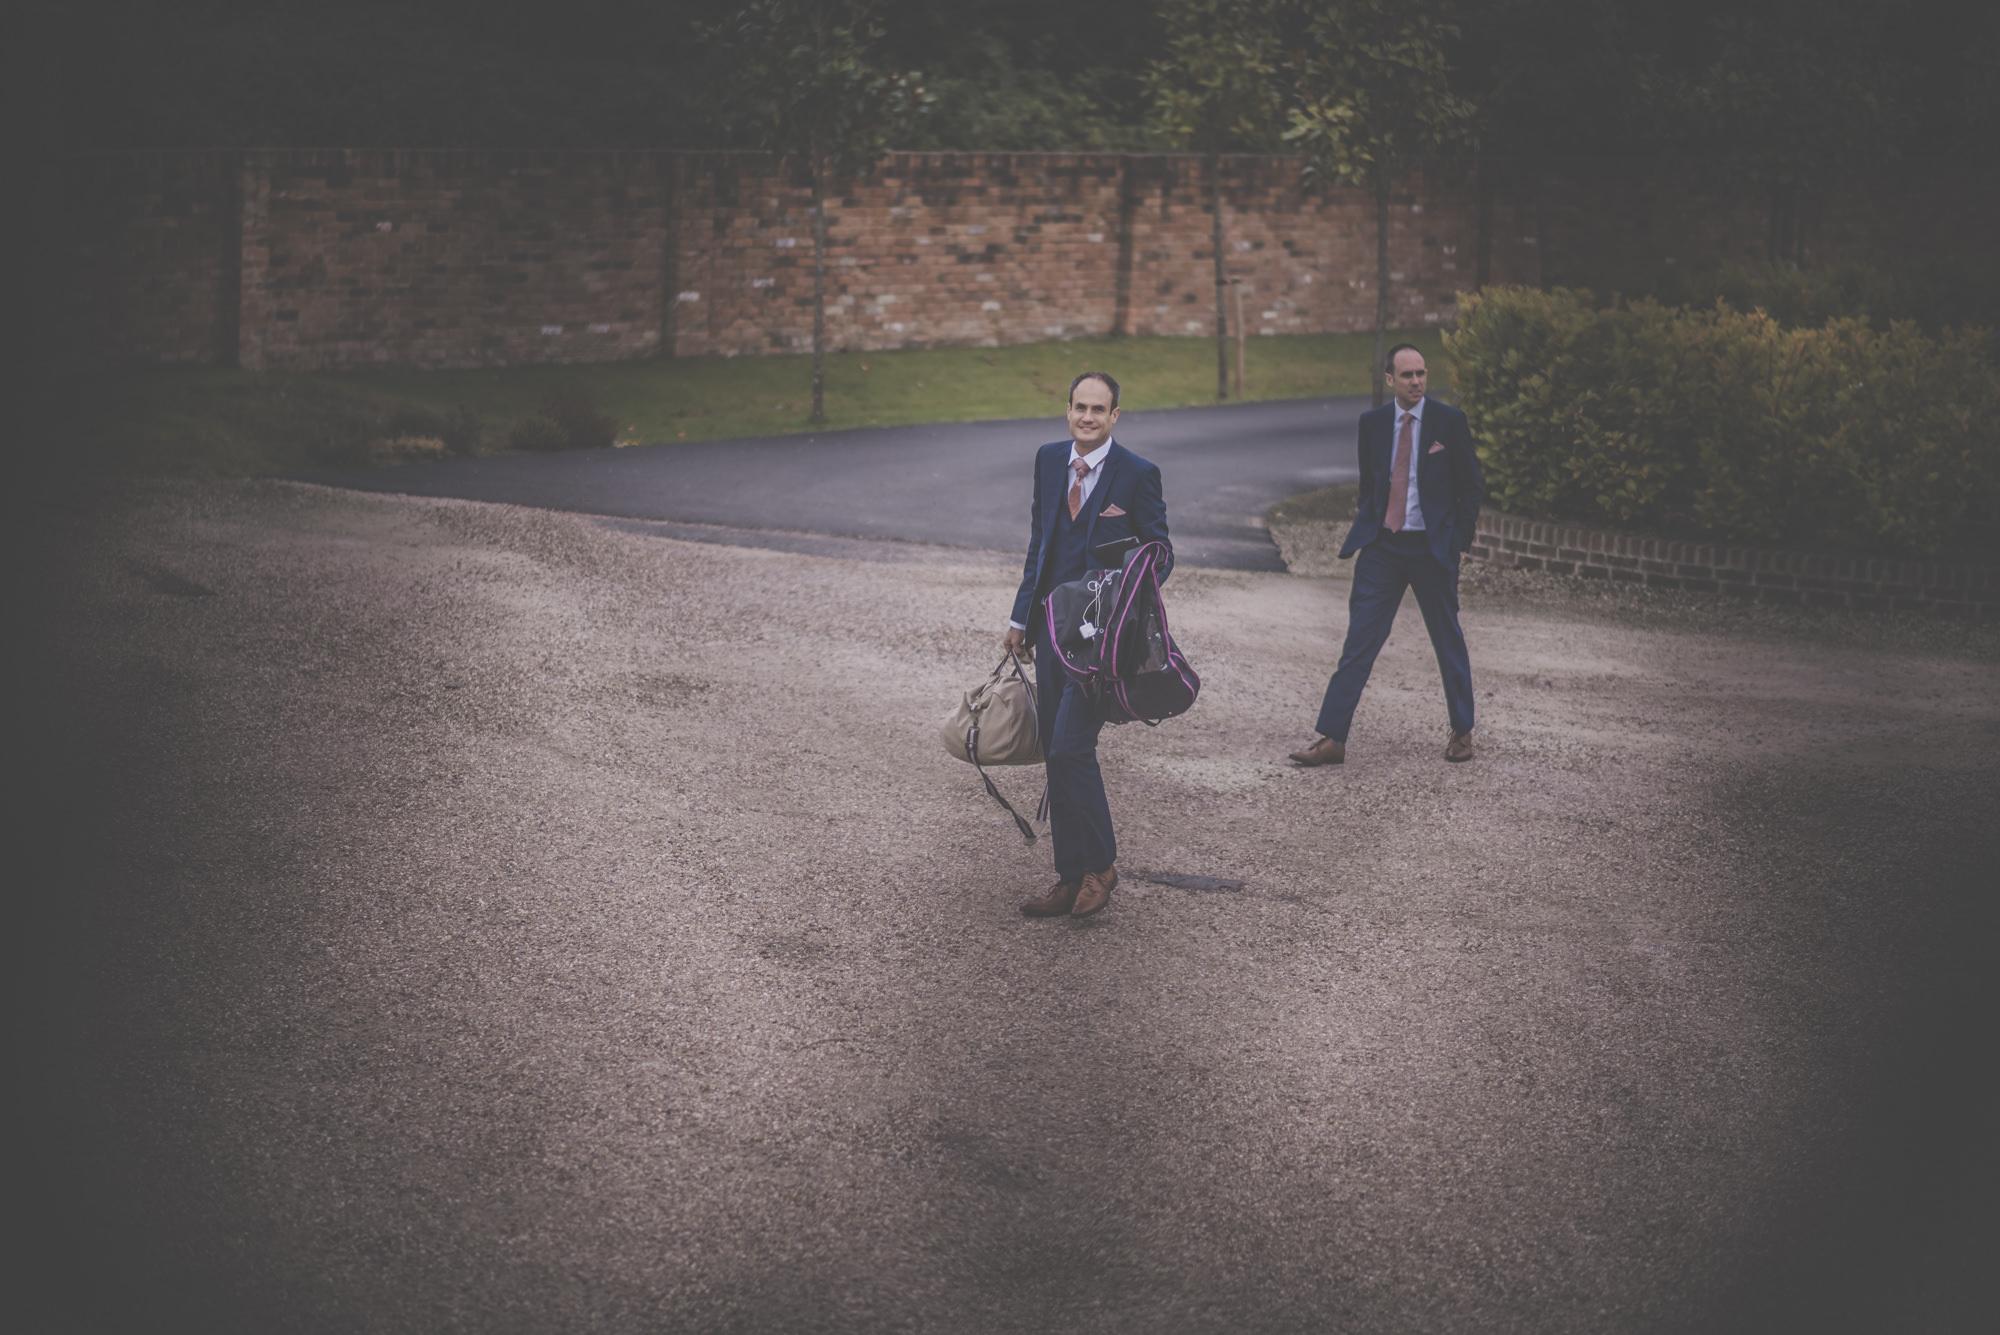 Charisse-and-James-wedding-in-Cain-Manor-Venue-Hampshire-Manu-Mendoza-Wedding-Photography-69.jpg